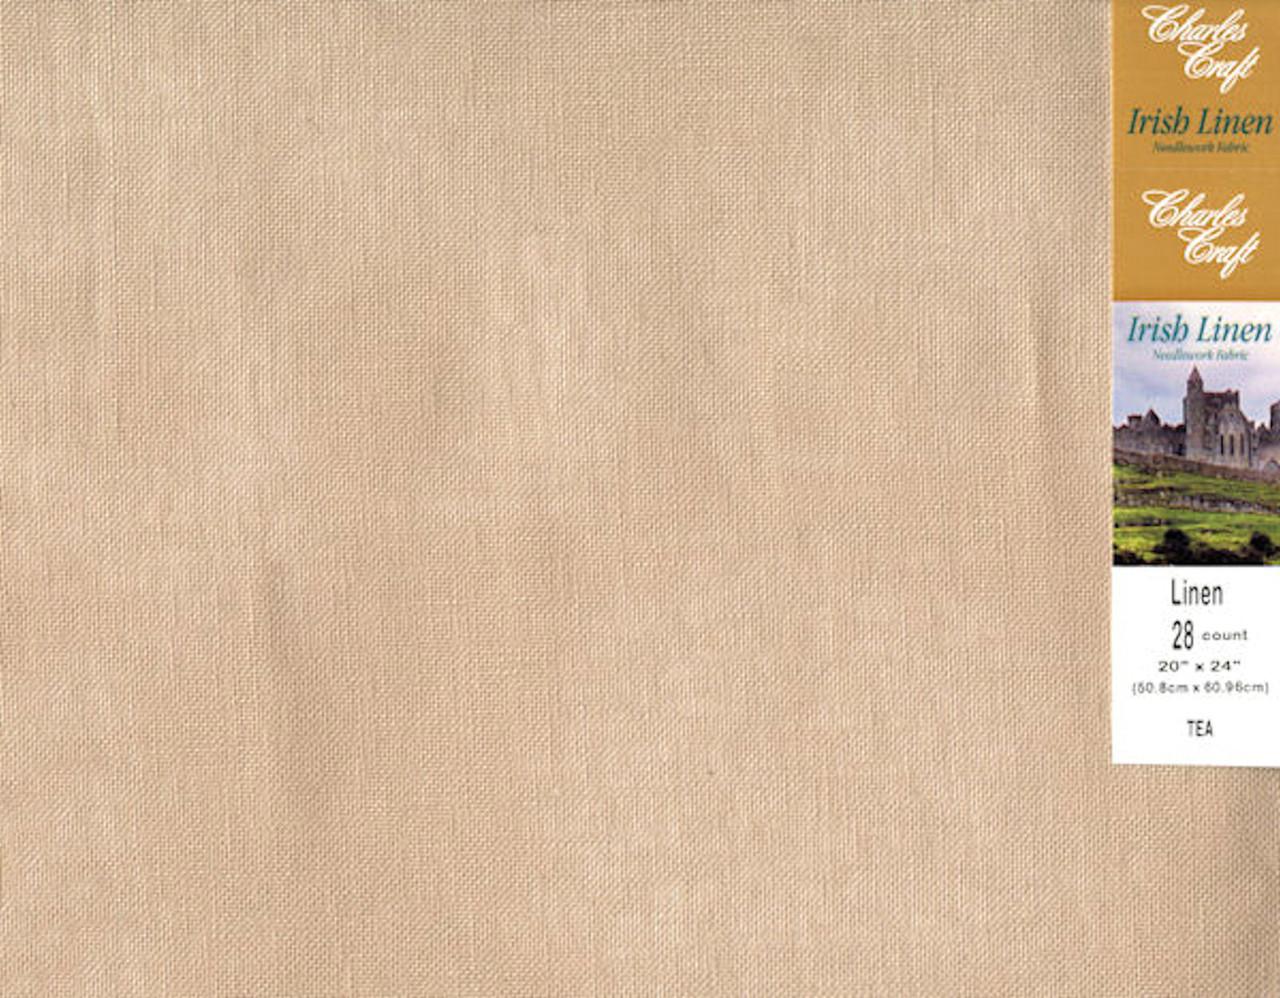 Charles Craft - 28 Ct Tea Irish Linen 20 x 24 in